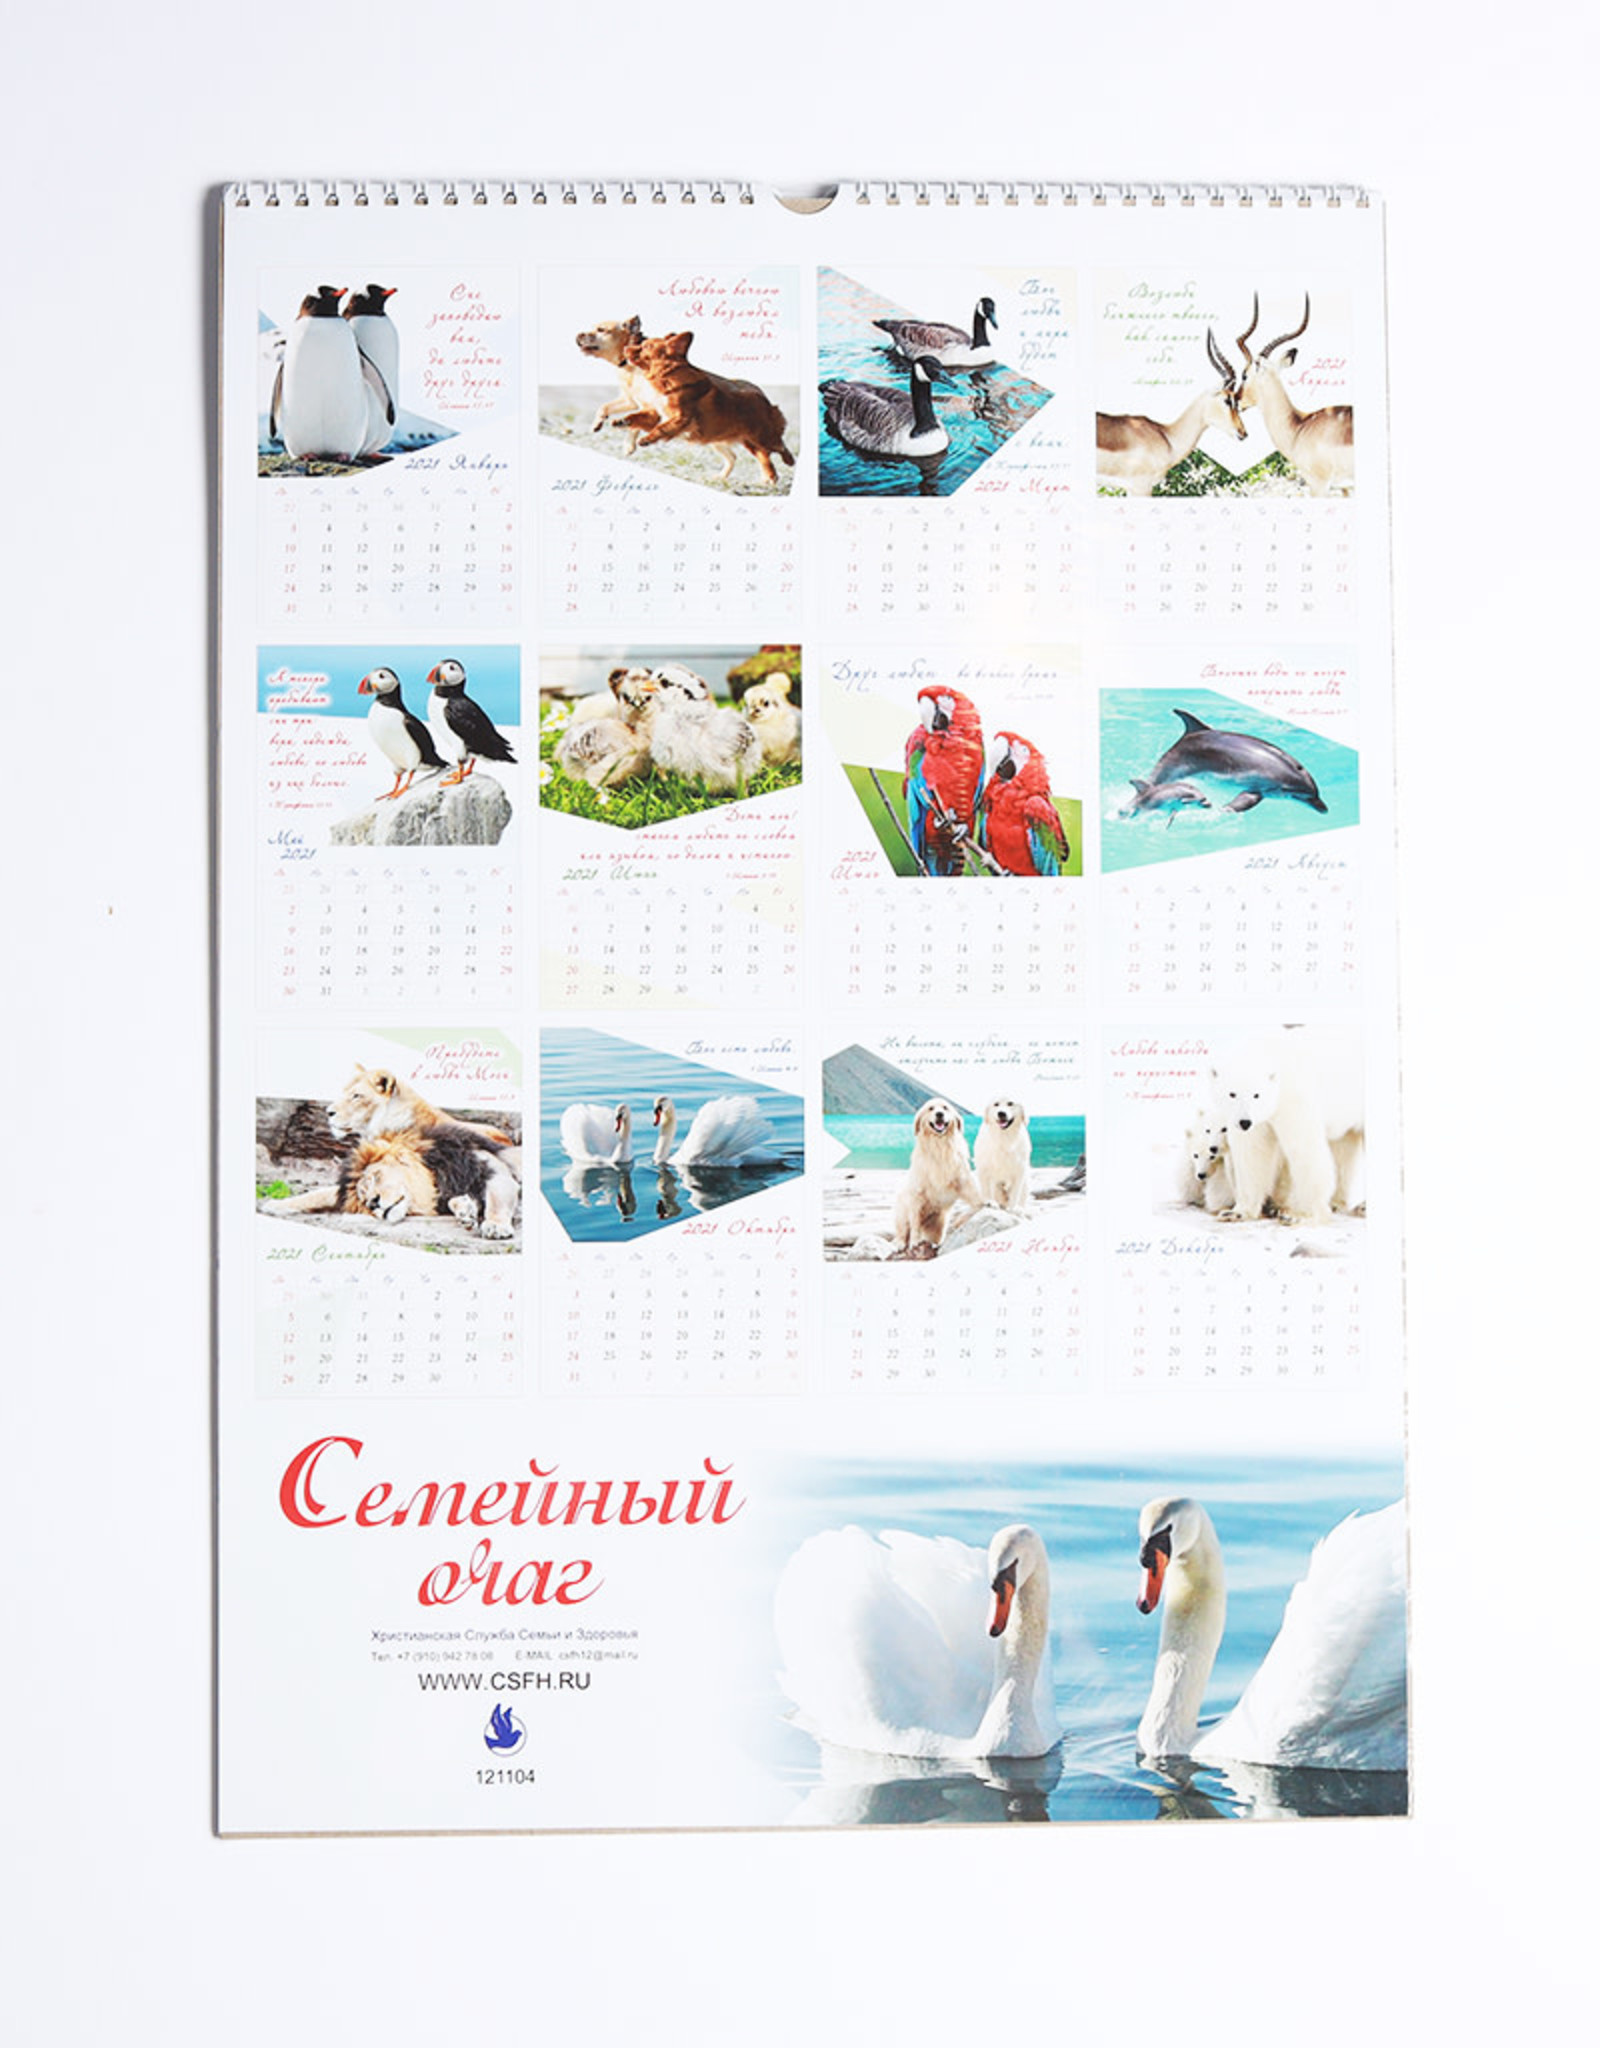 Семейный Очаг, Календарь